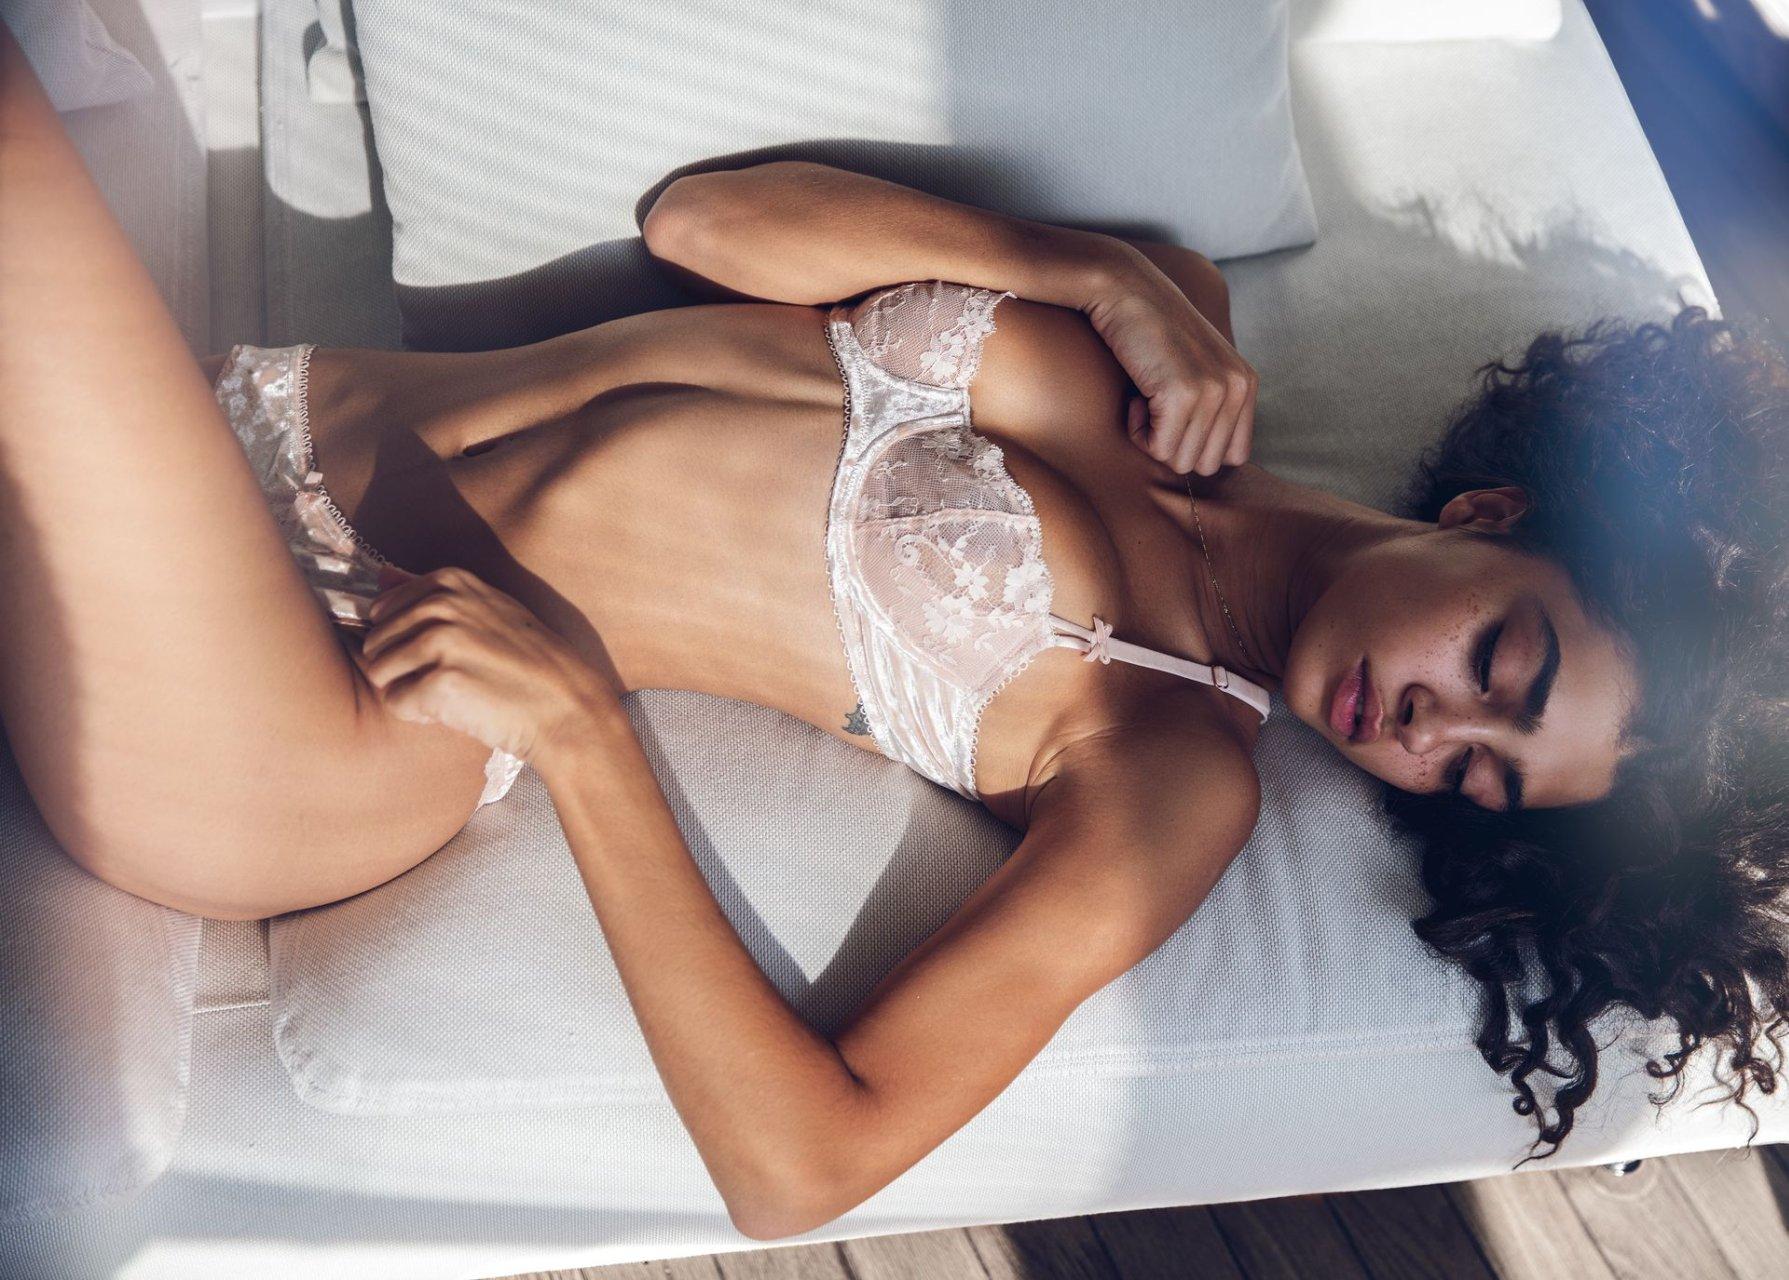 Pity, Emma cornell nude